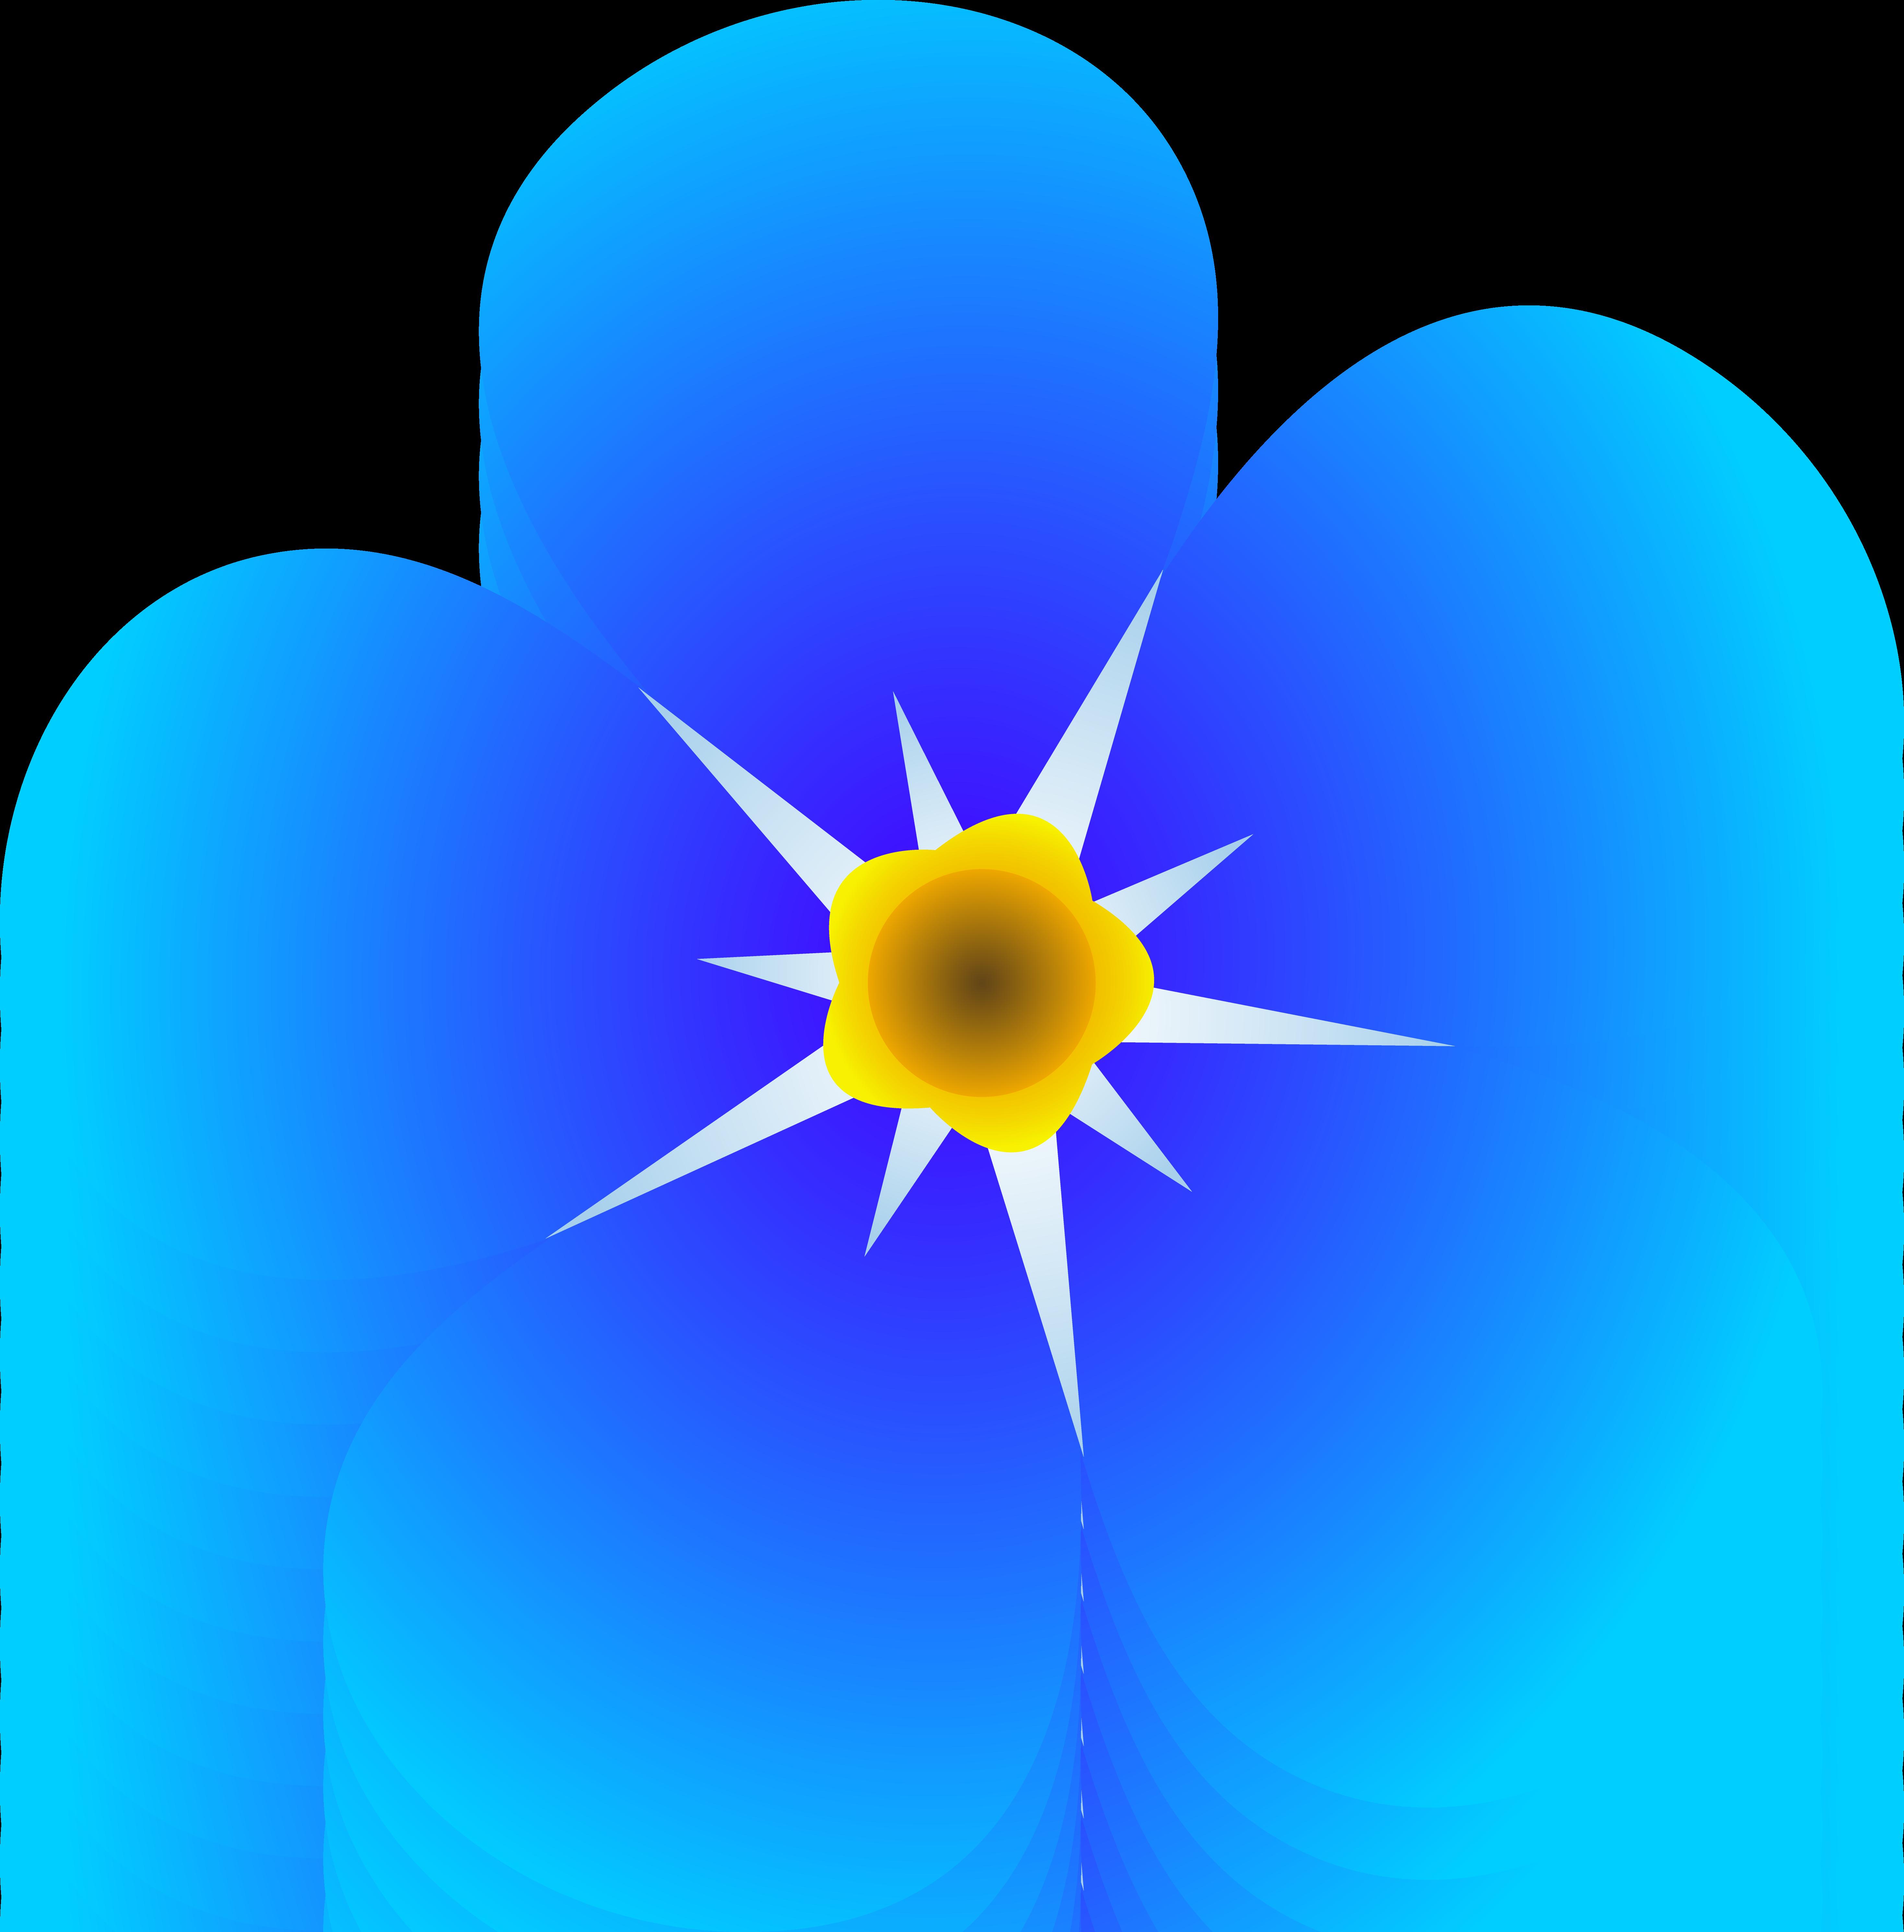 Petal clipart single Drawings Blue clipart Blue Download